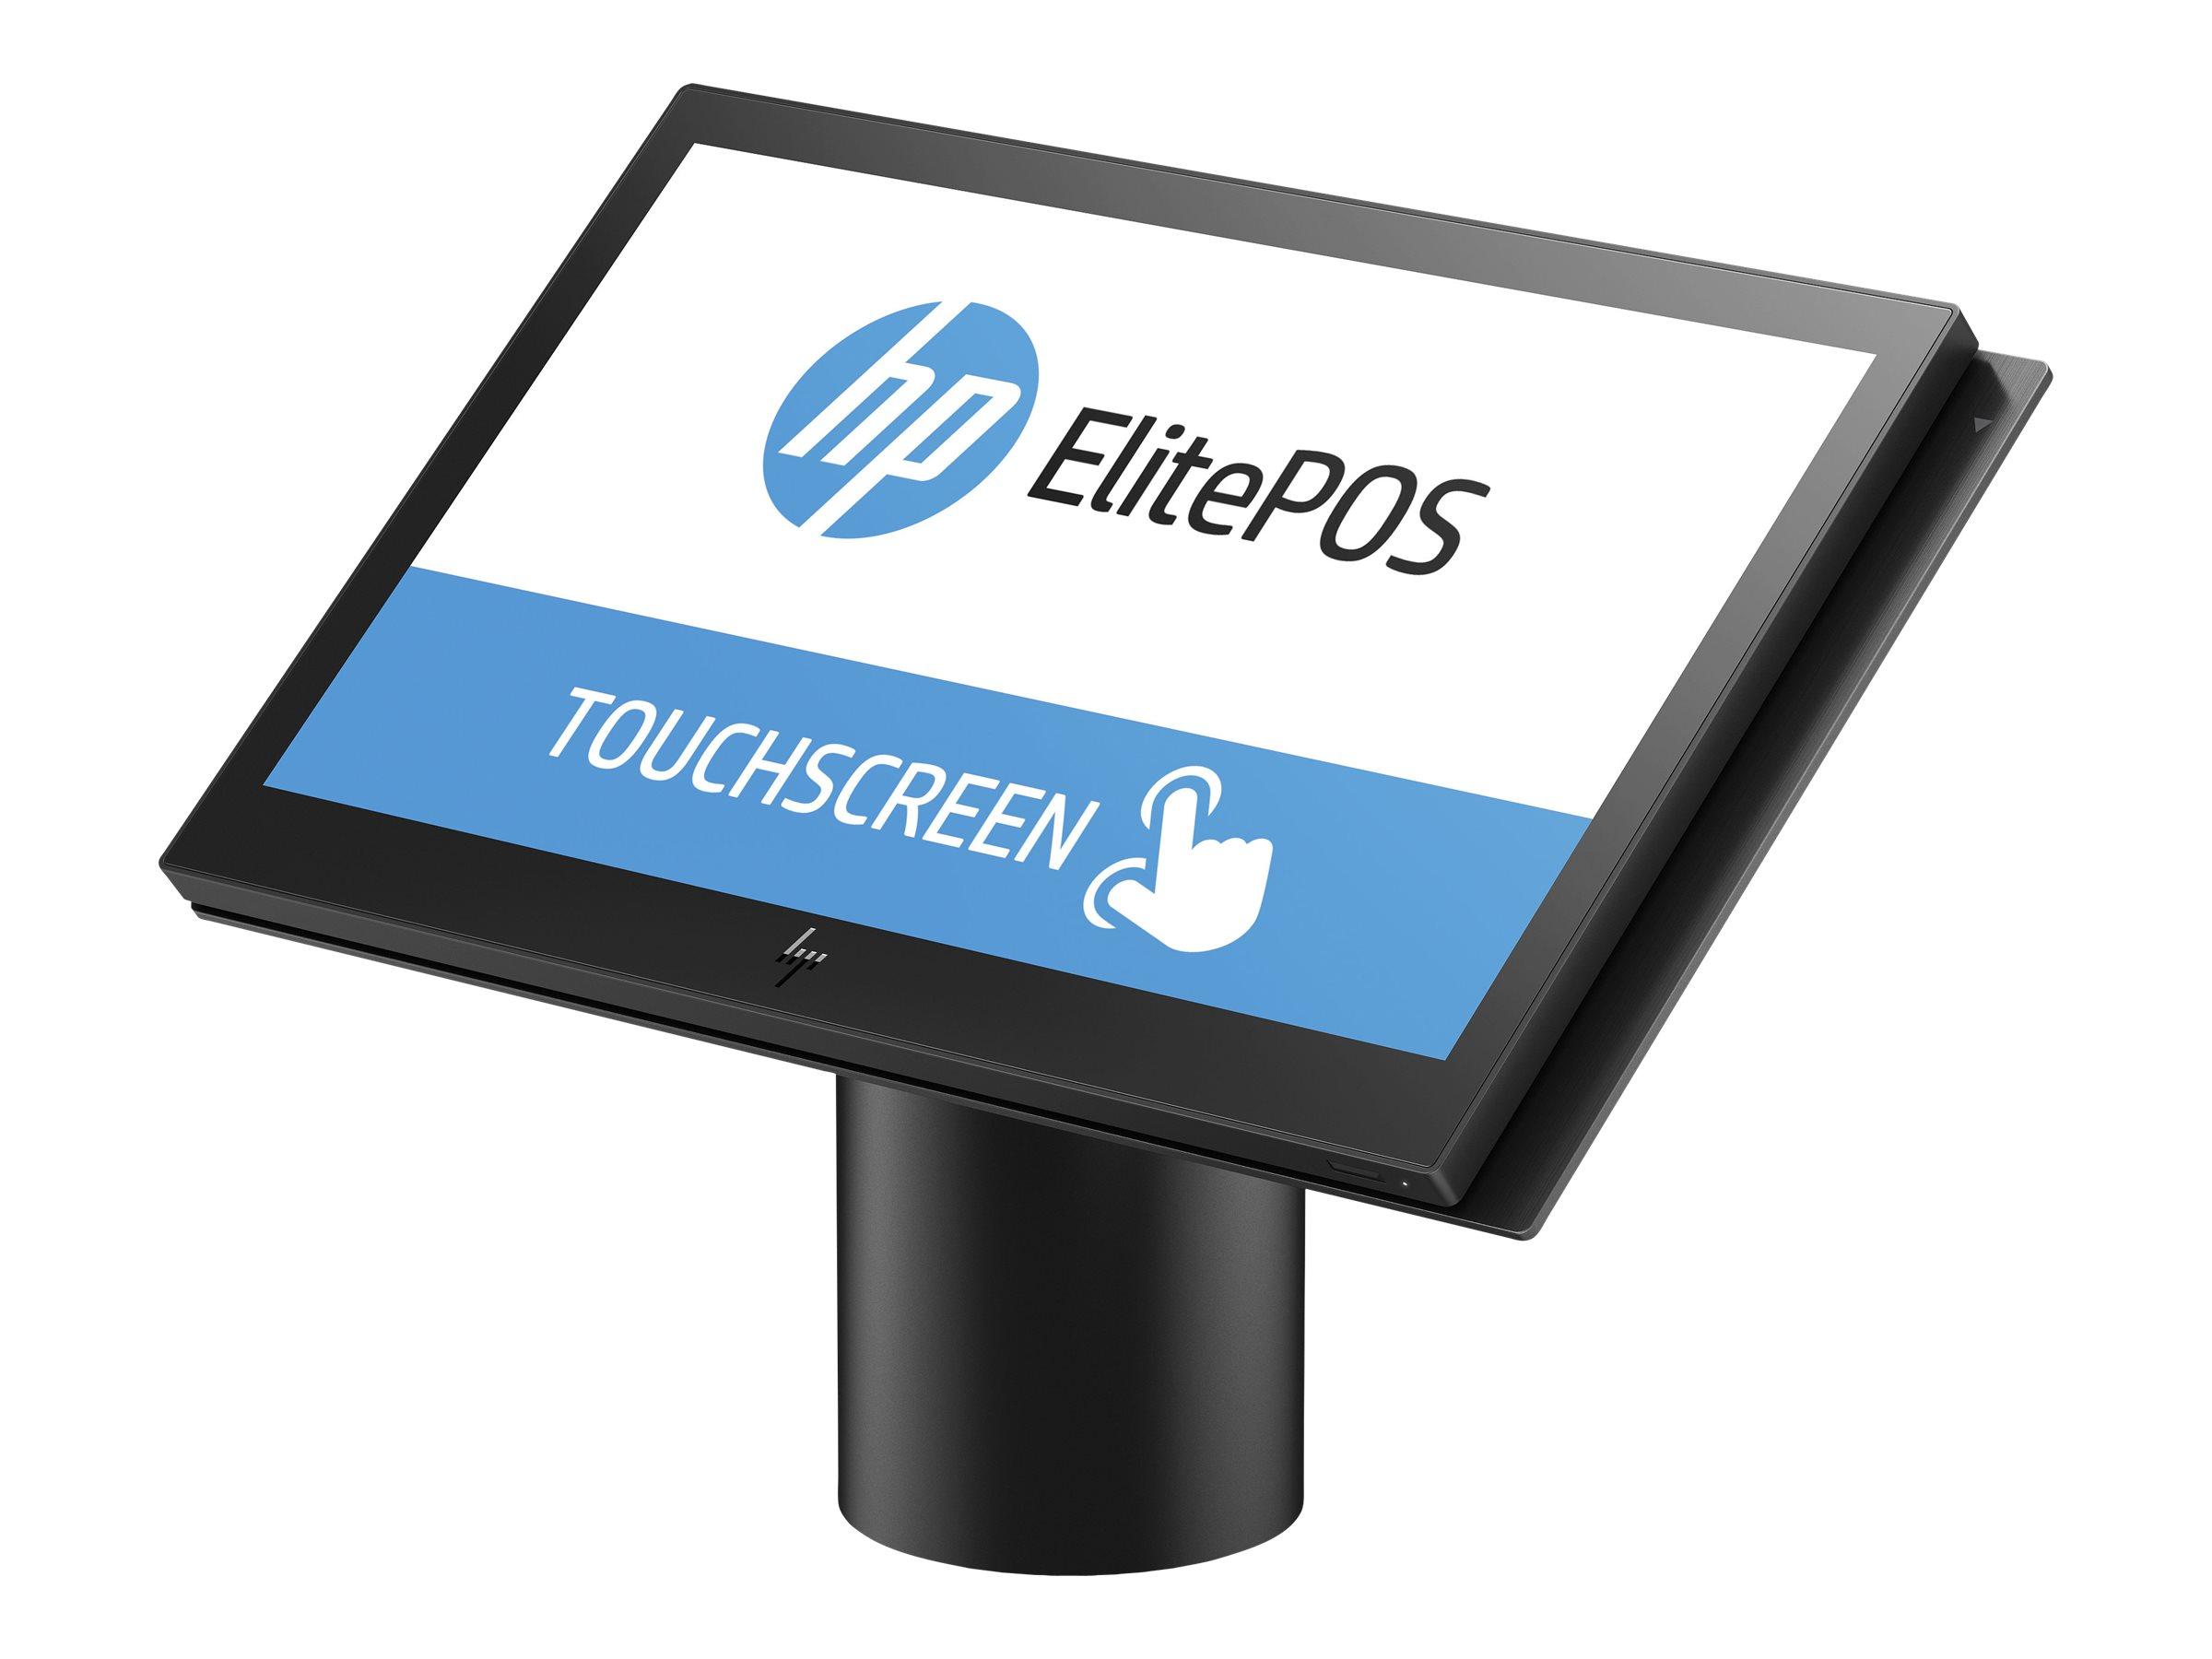 HP ElitePOS G1 Retail System 143 - All-in-One (Komplettlösung) - 1 x Core i3 7100U / 2.4 GHz - RAM 4 GB - SSD 128 GB - 3D V-NAND